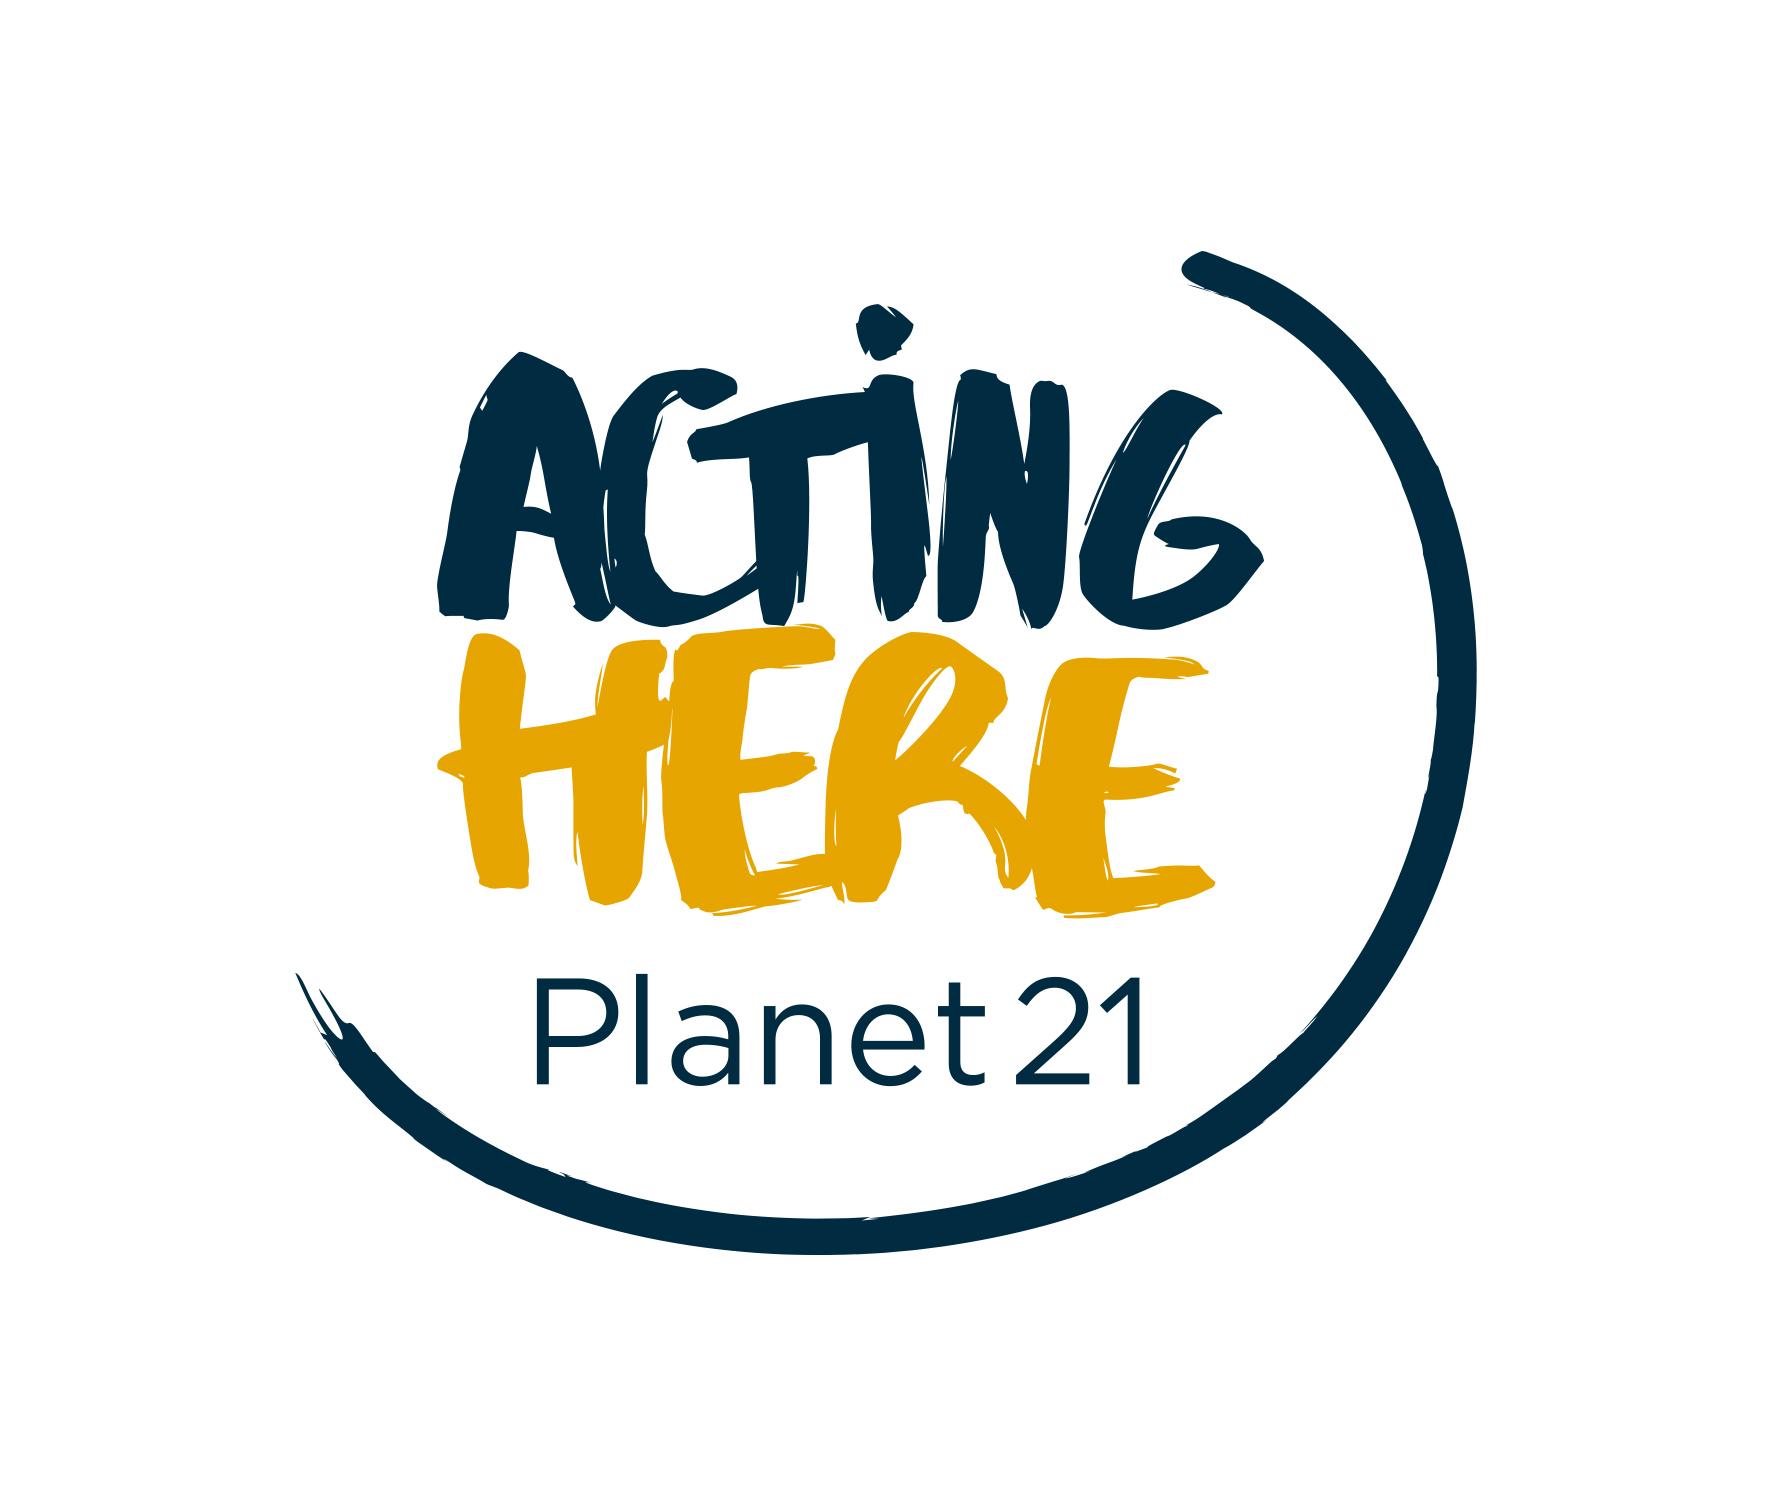 acting_here logo